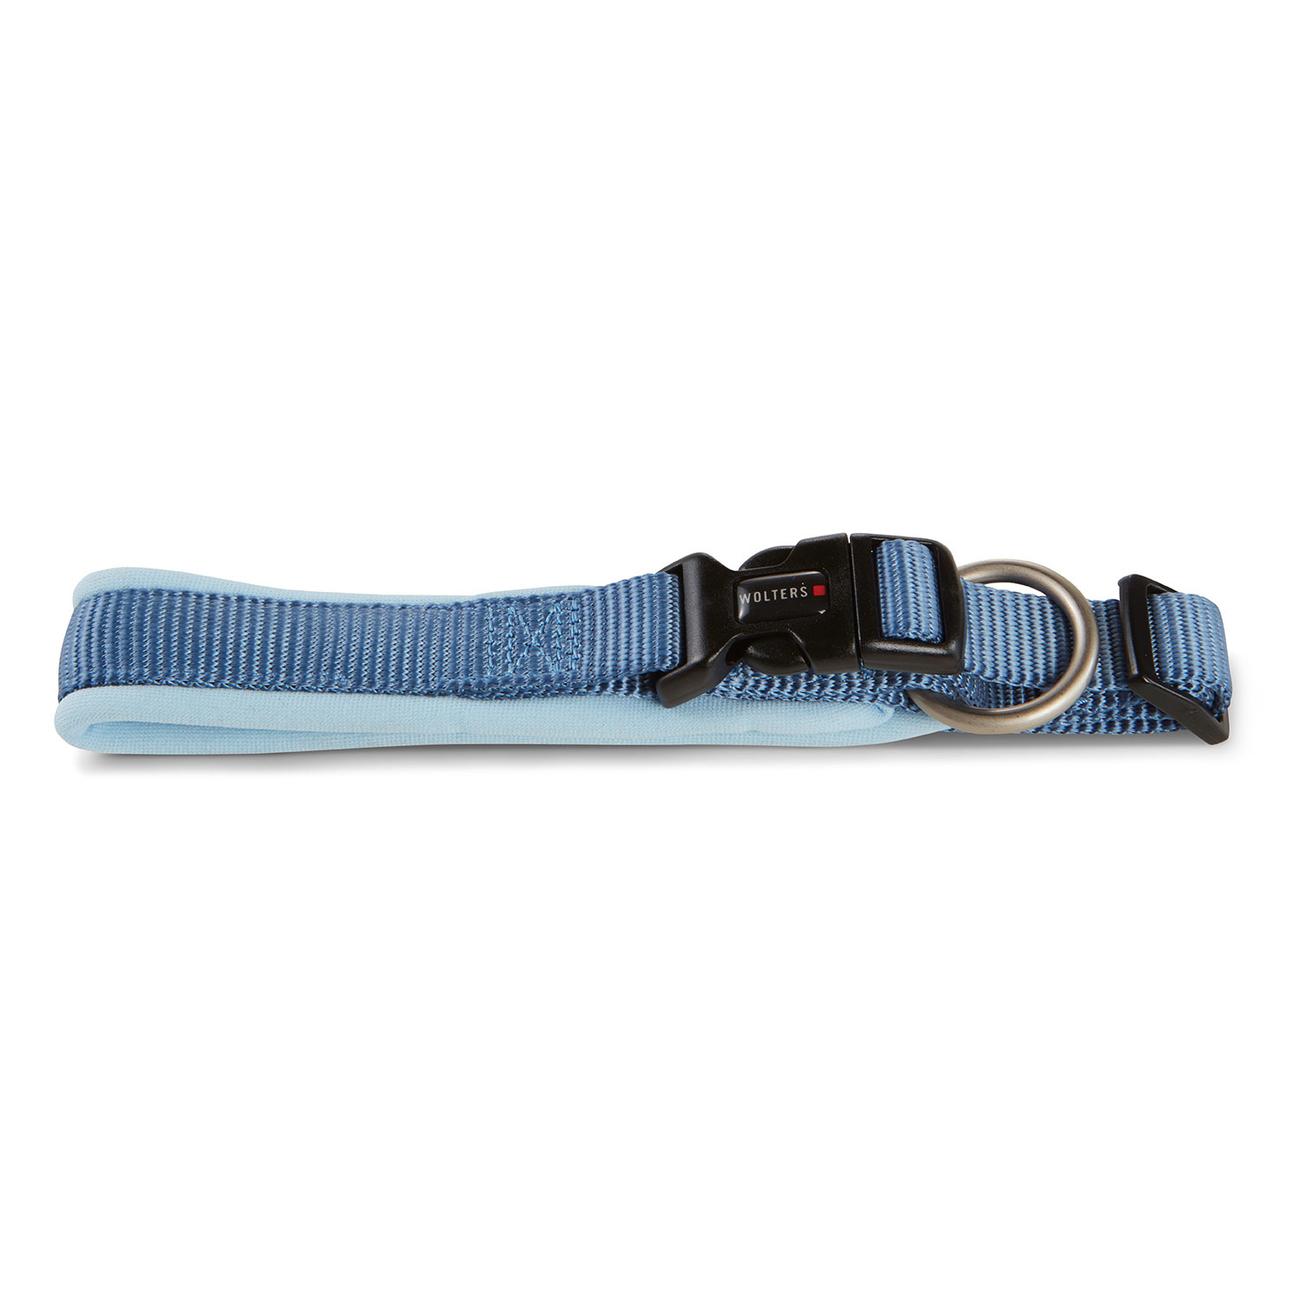 Wolters Halsband Professional Comfort Extra breit, Bild 2